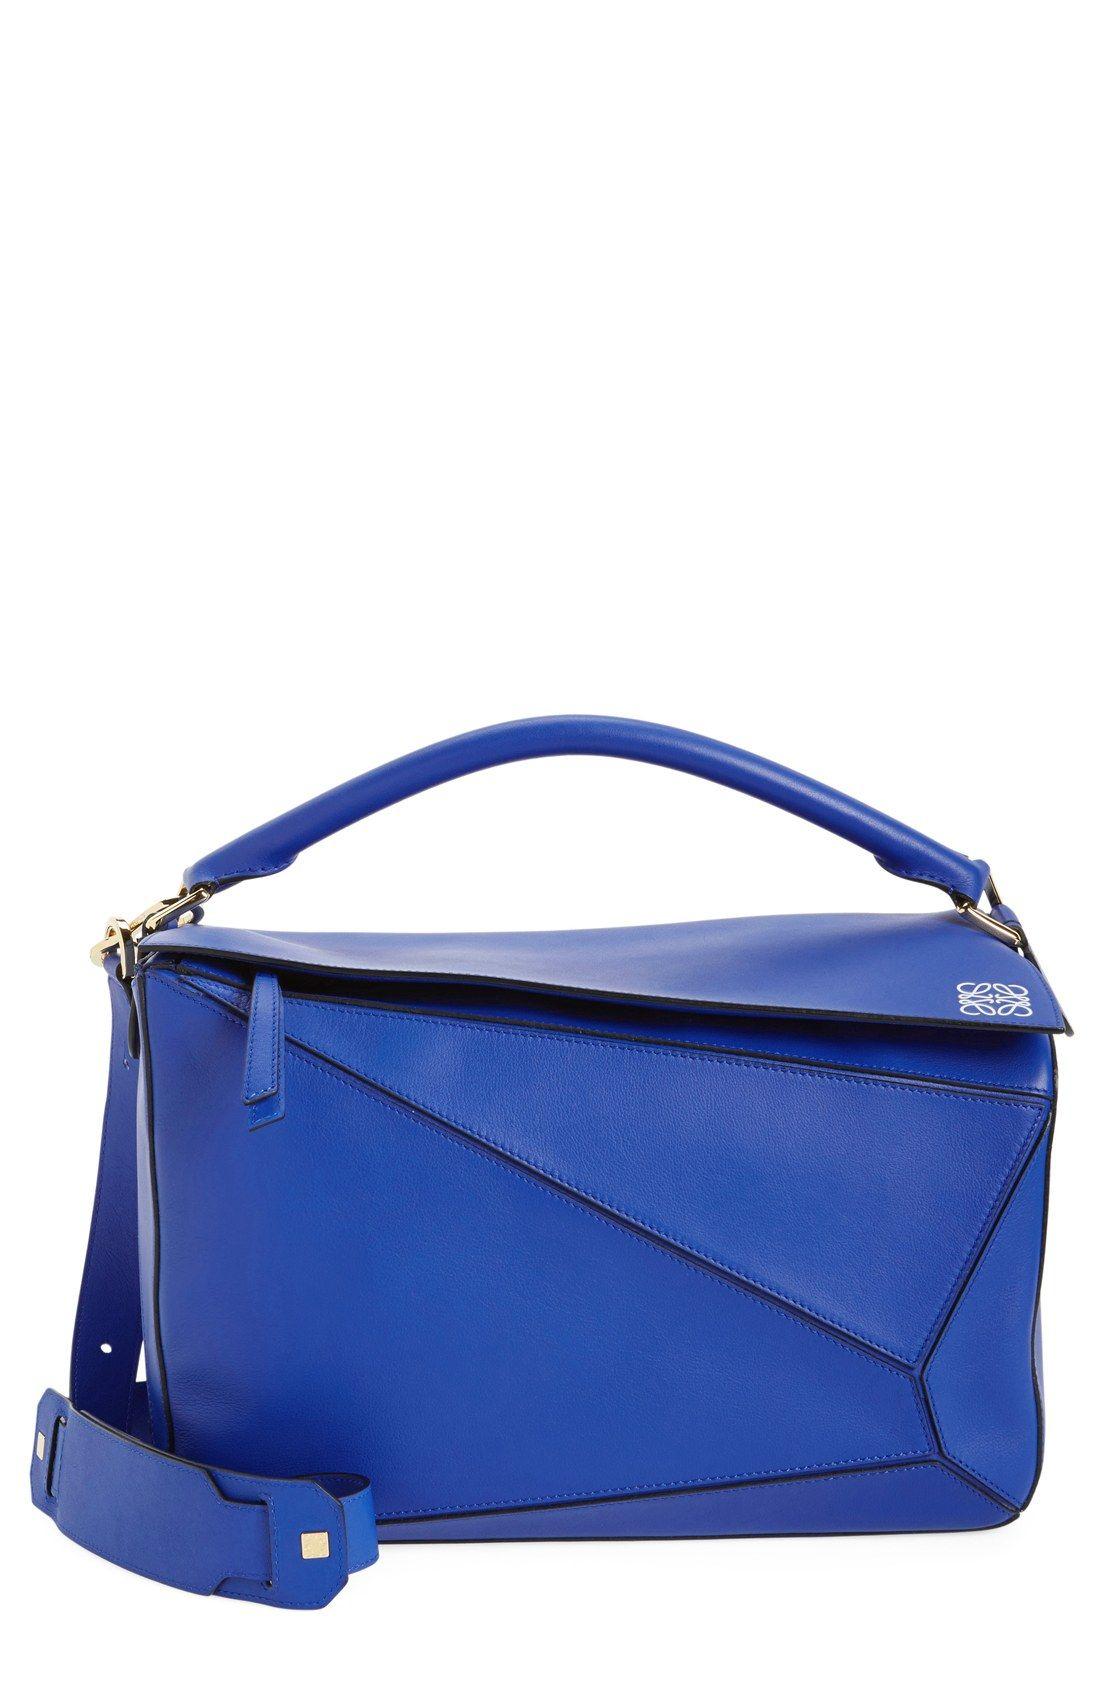 Loewe 'Large Puzzle' Leather Bag Royal Blue Leather Handbag Tote ...